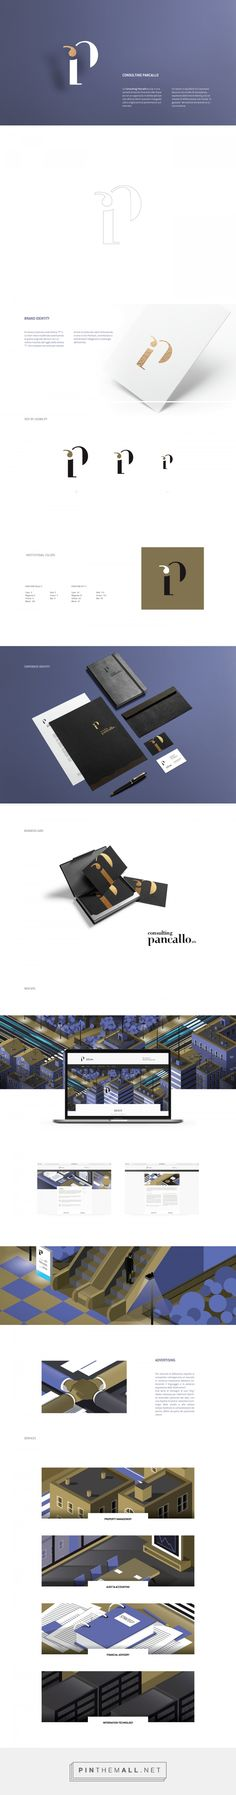 Consulting Pancallo on Behance - Brand Identity Graphic Design Branding, Typography Design, Logo Branding, Logo Design, Logos, Corporate Identity, Visual Identity, Brand Identity, Adobe Animate